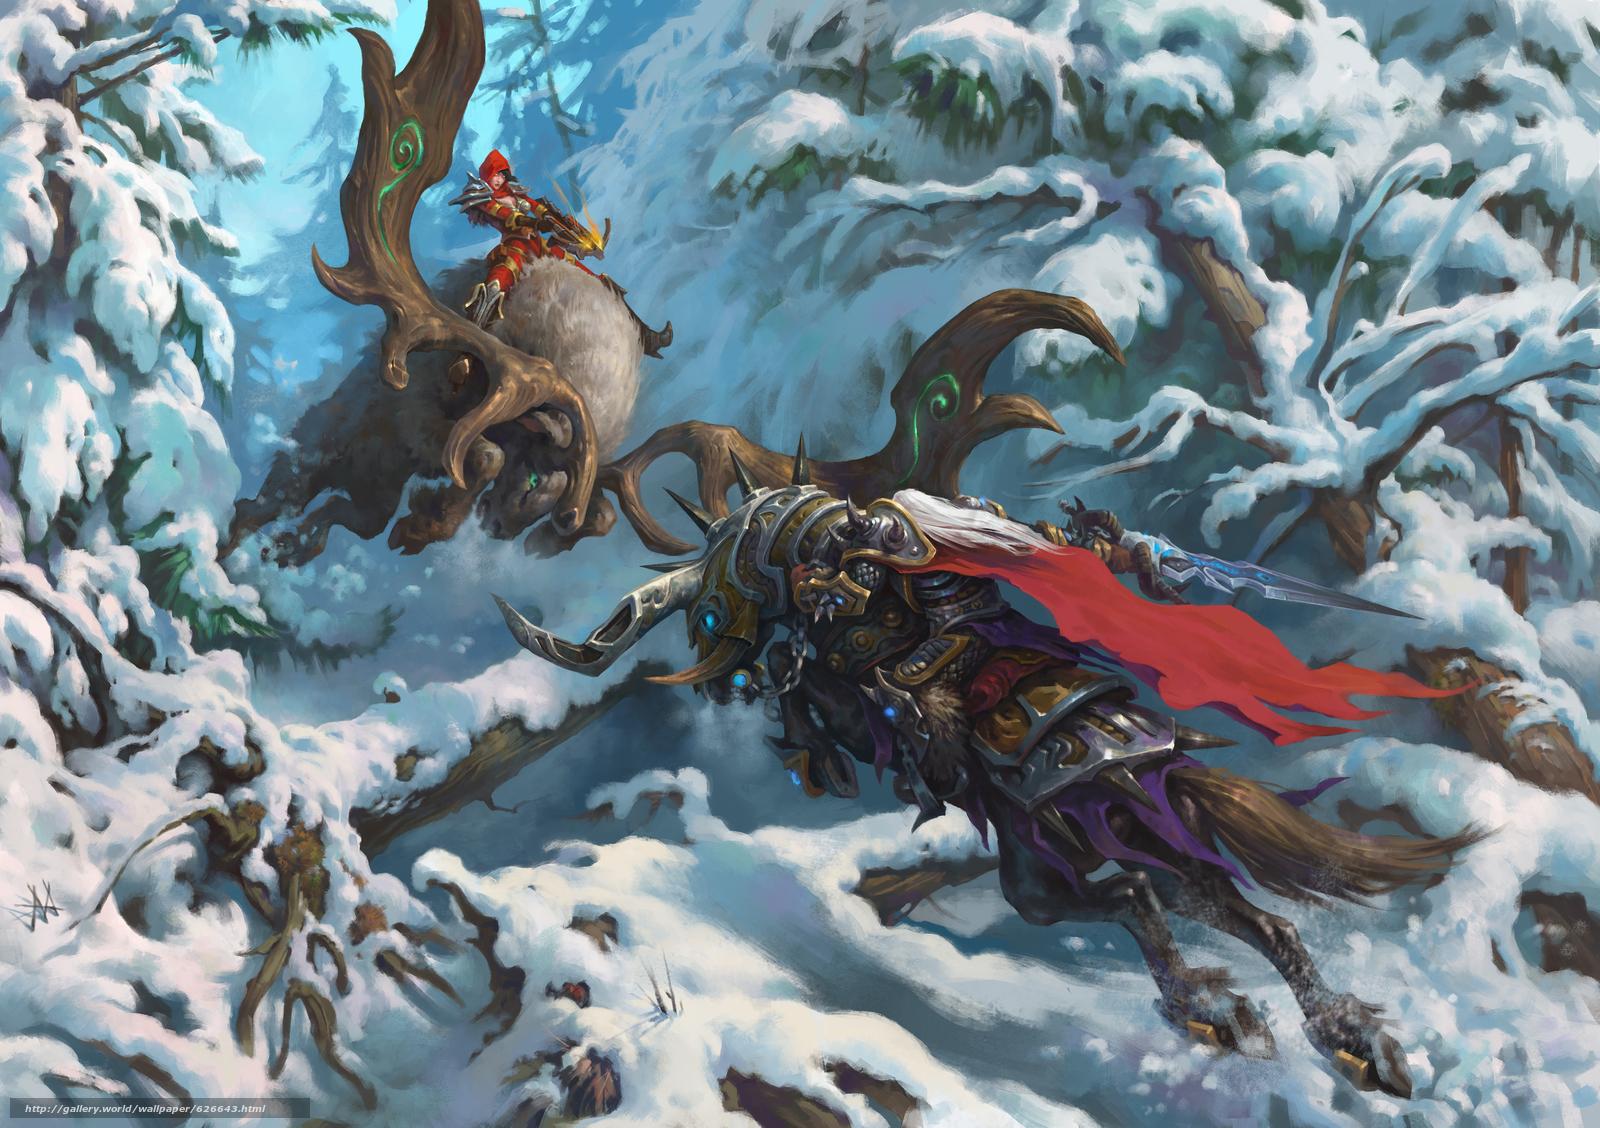 Скачать на телефон обои фото картинку на тему Heroes of the Storm, Arthas, The Lich King, Valla, Demon Hunter, Артас, Король-лич, Валла, Охотница на демонов, сражение, битва, зима, снег, разширение 4254x3000